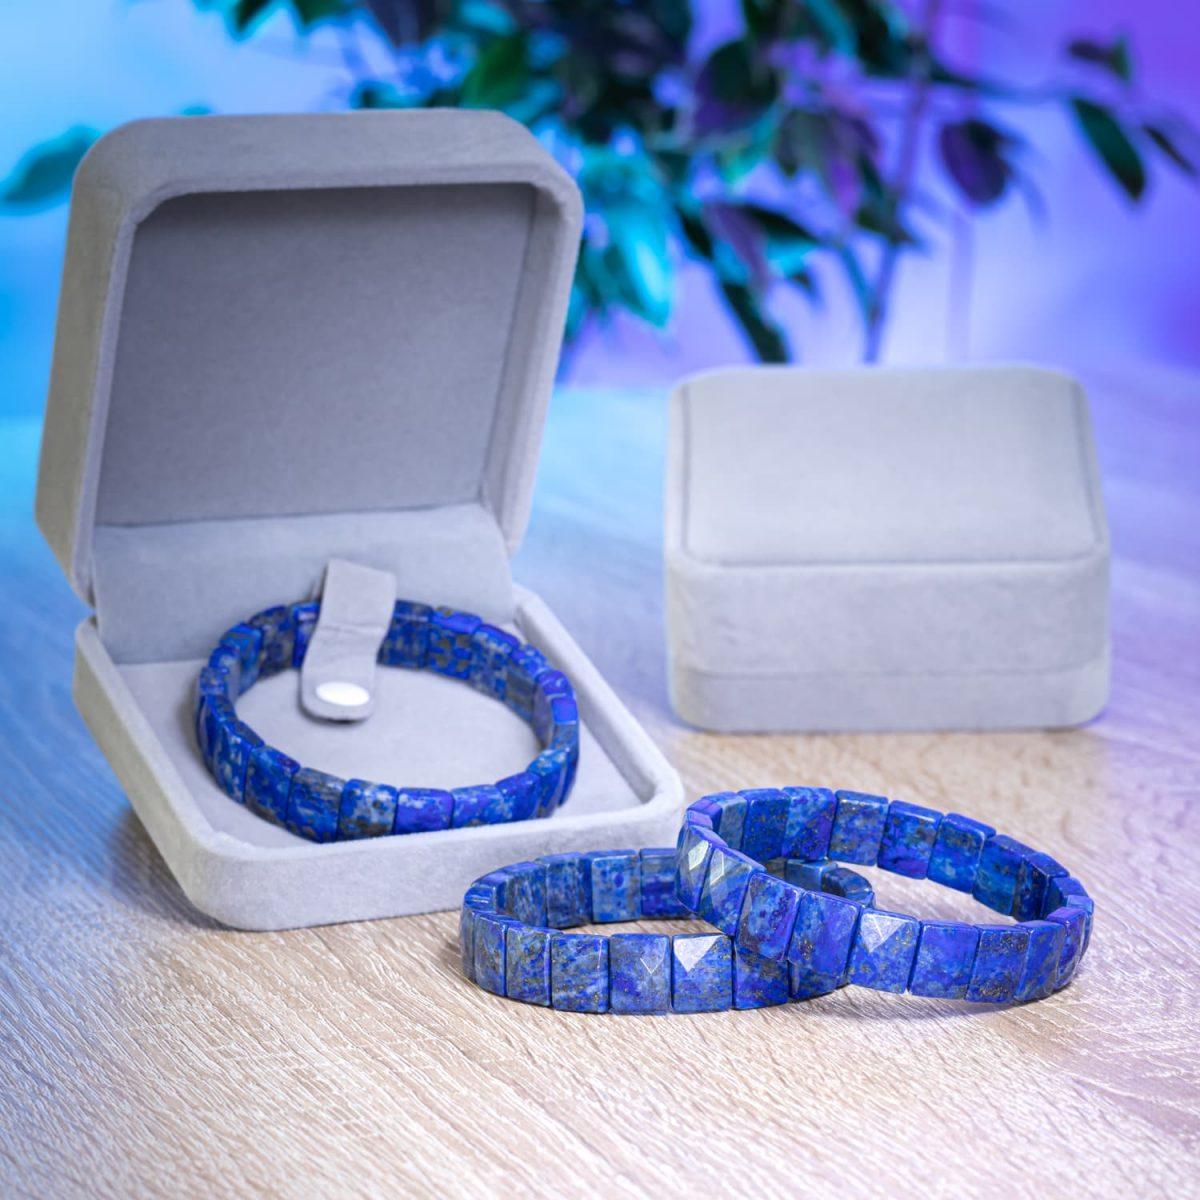 meliora-zapestnica-lapis-lazuli-poldragi-kamen-portal8